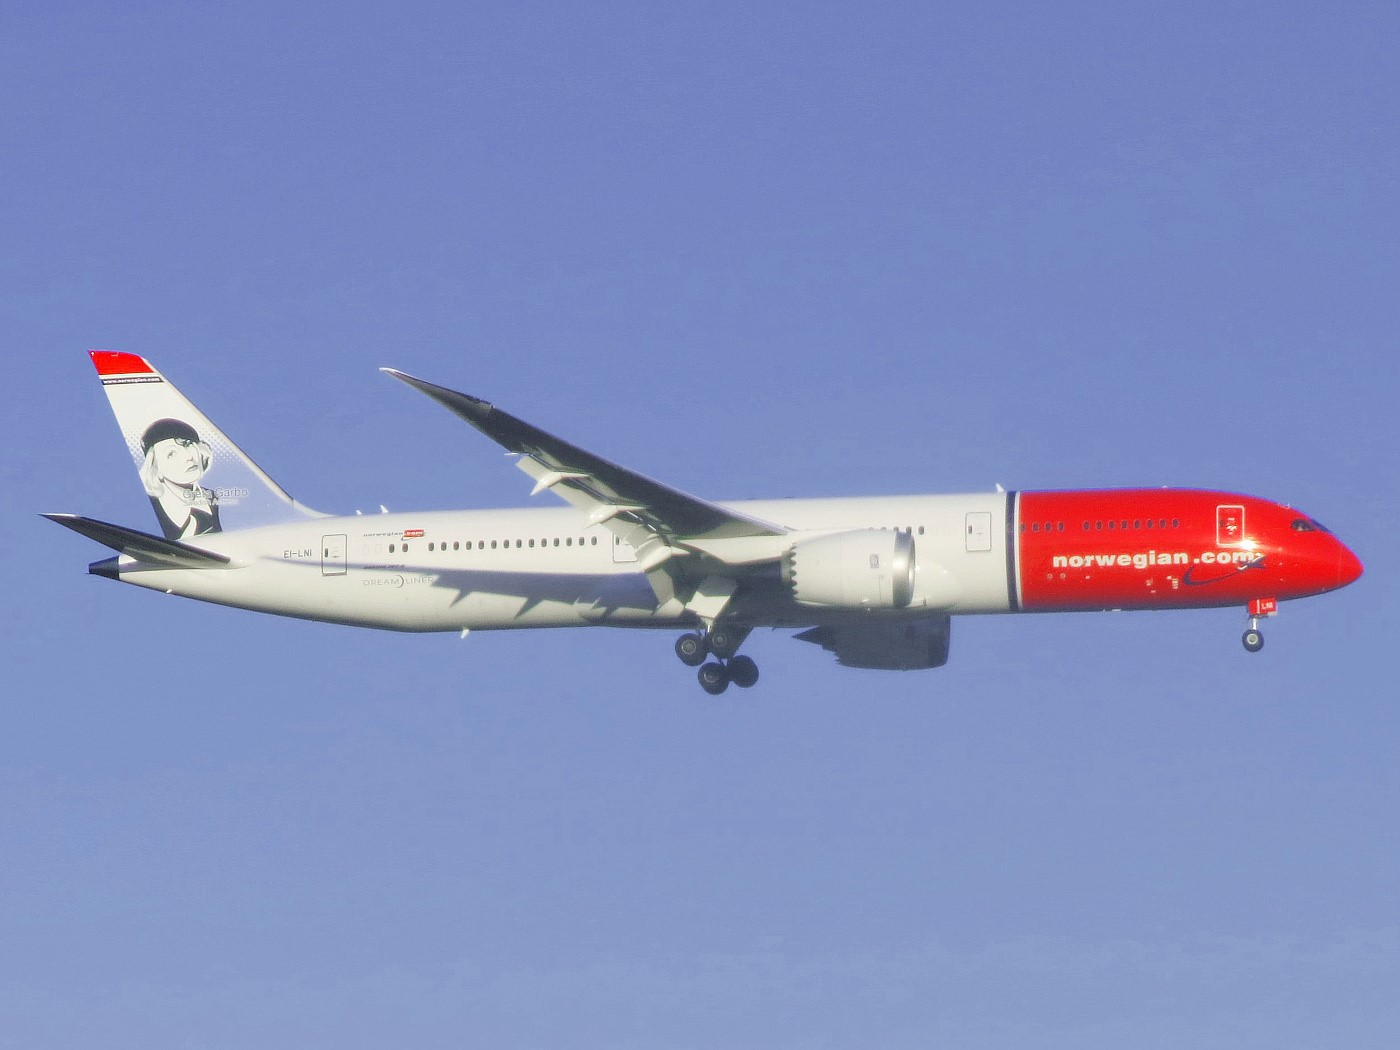 norwegian_air_shuttle_boeing_787-9_dreamliner_ei-lni_greta_garbo_approaching_jfk_airport